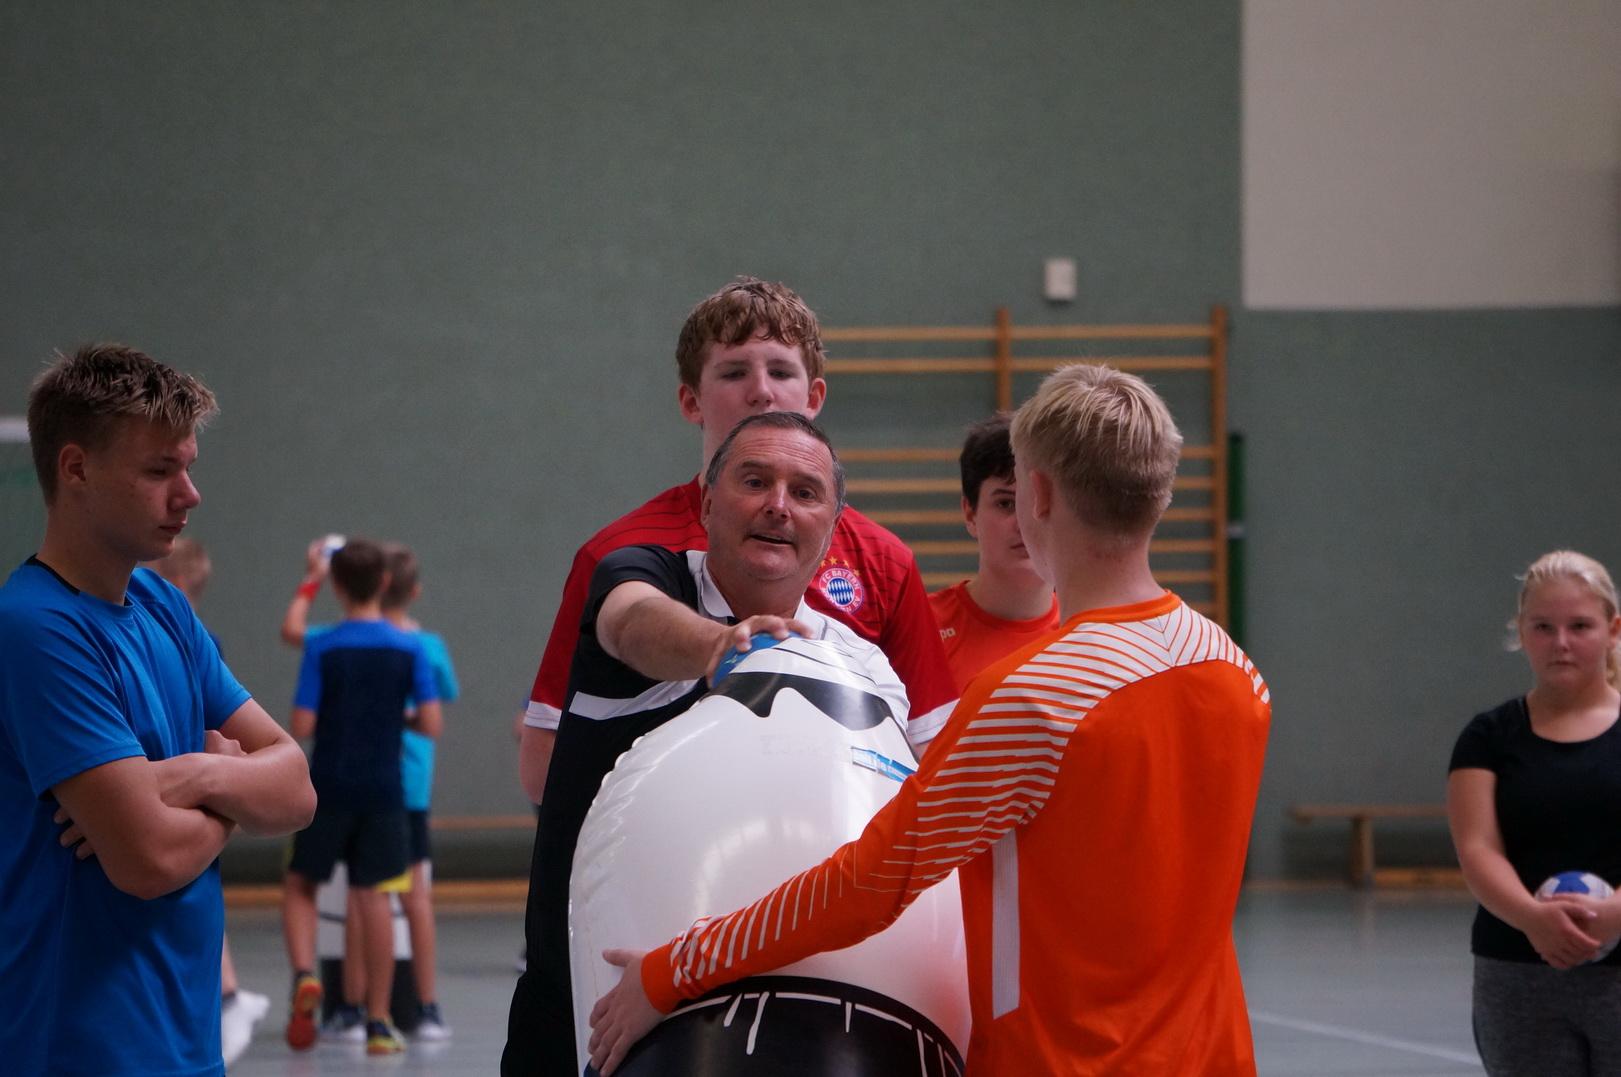 201808_Handballcamp_SDH_MG_208w